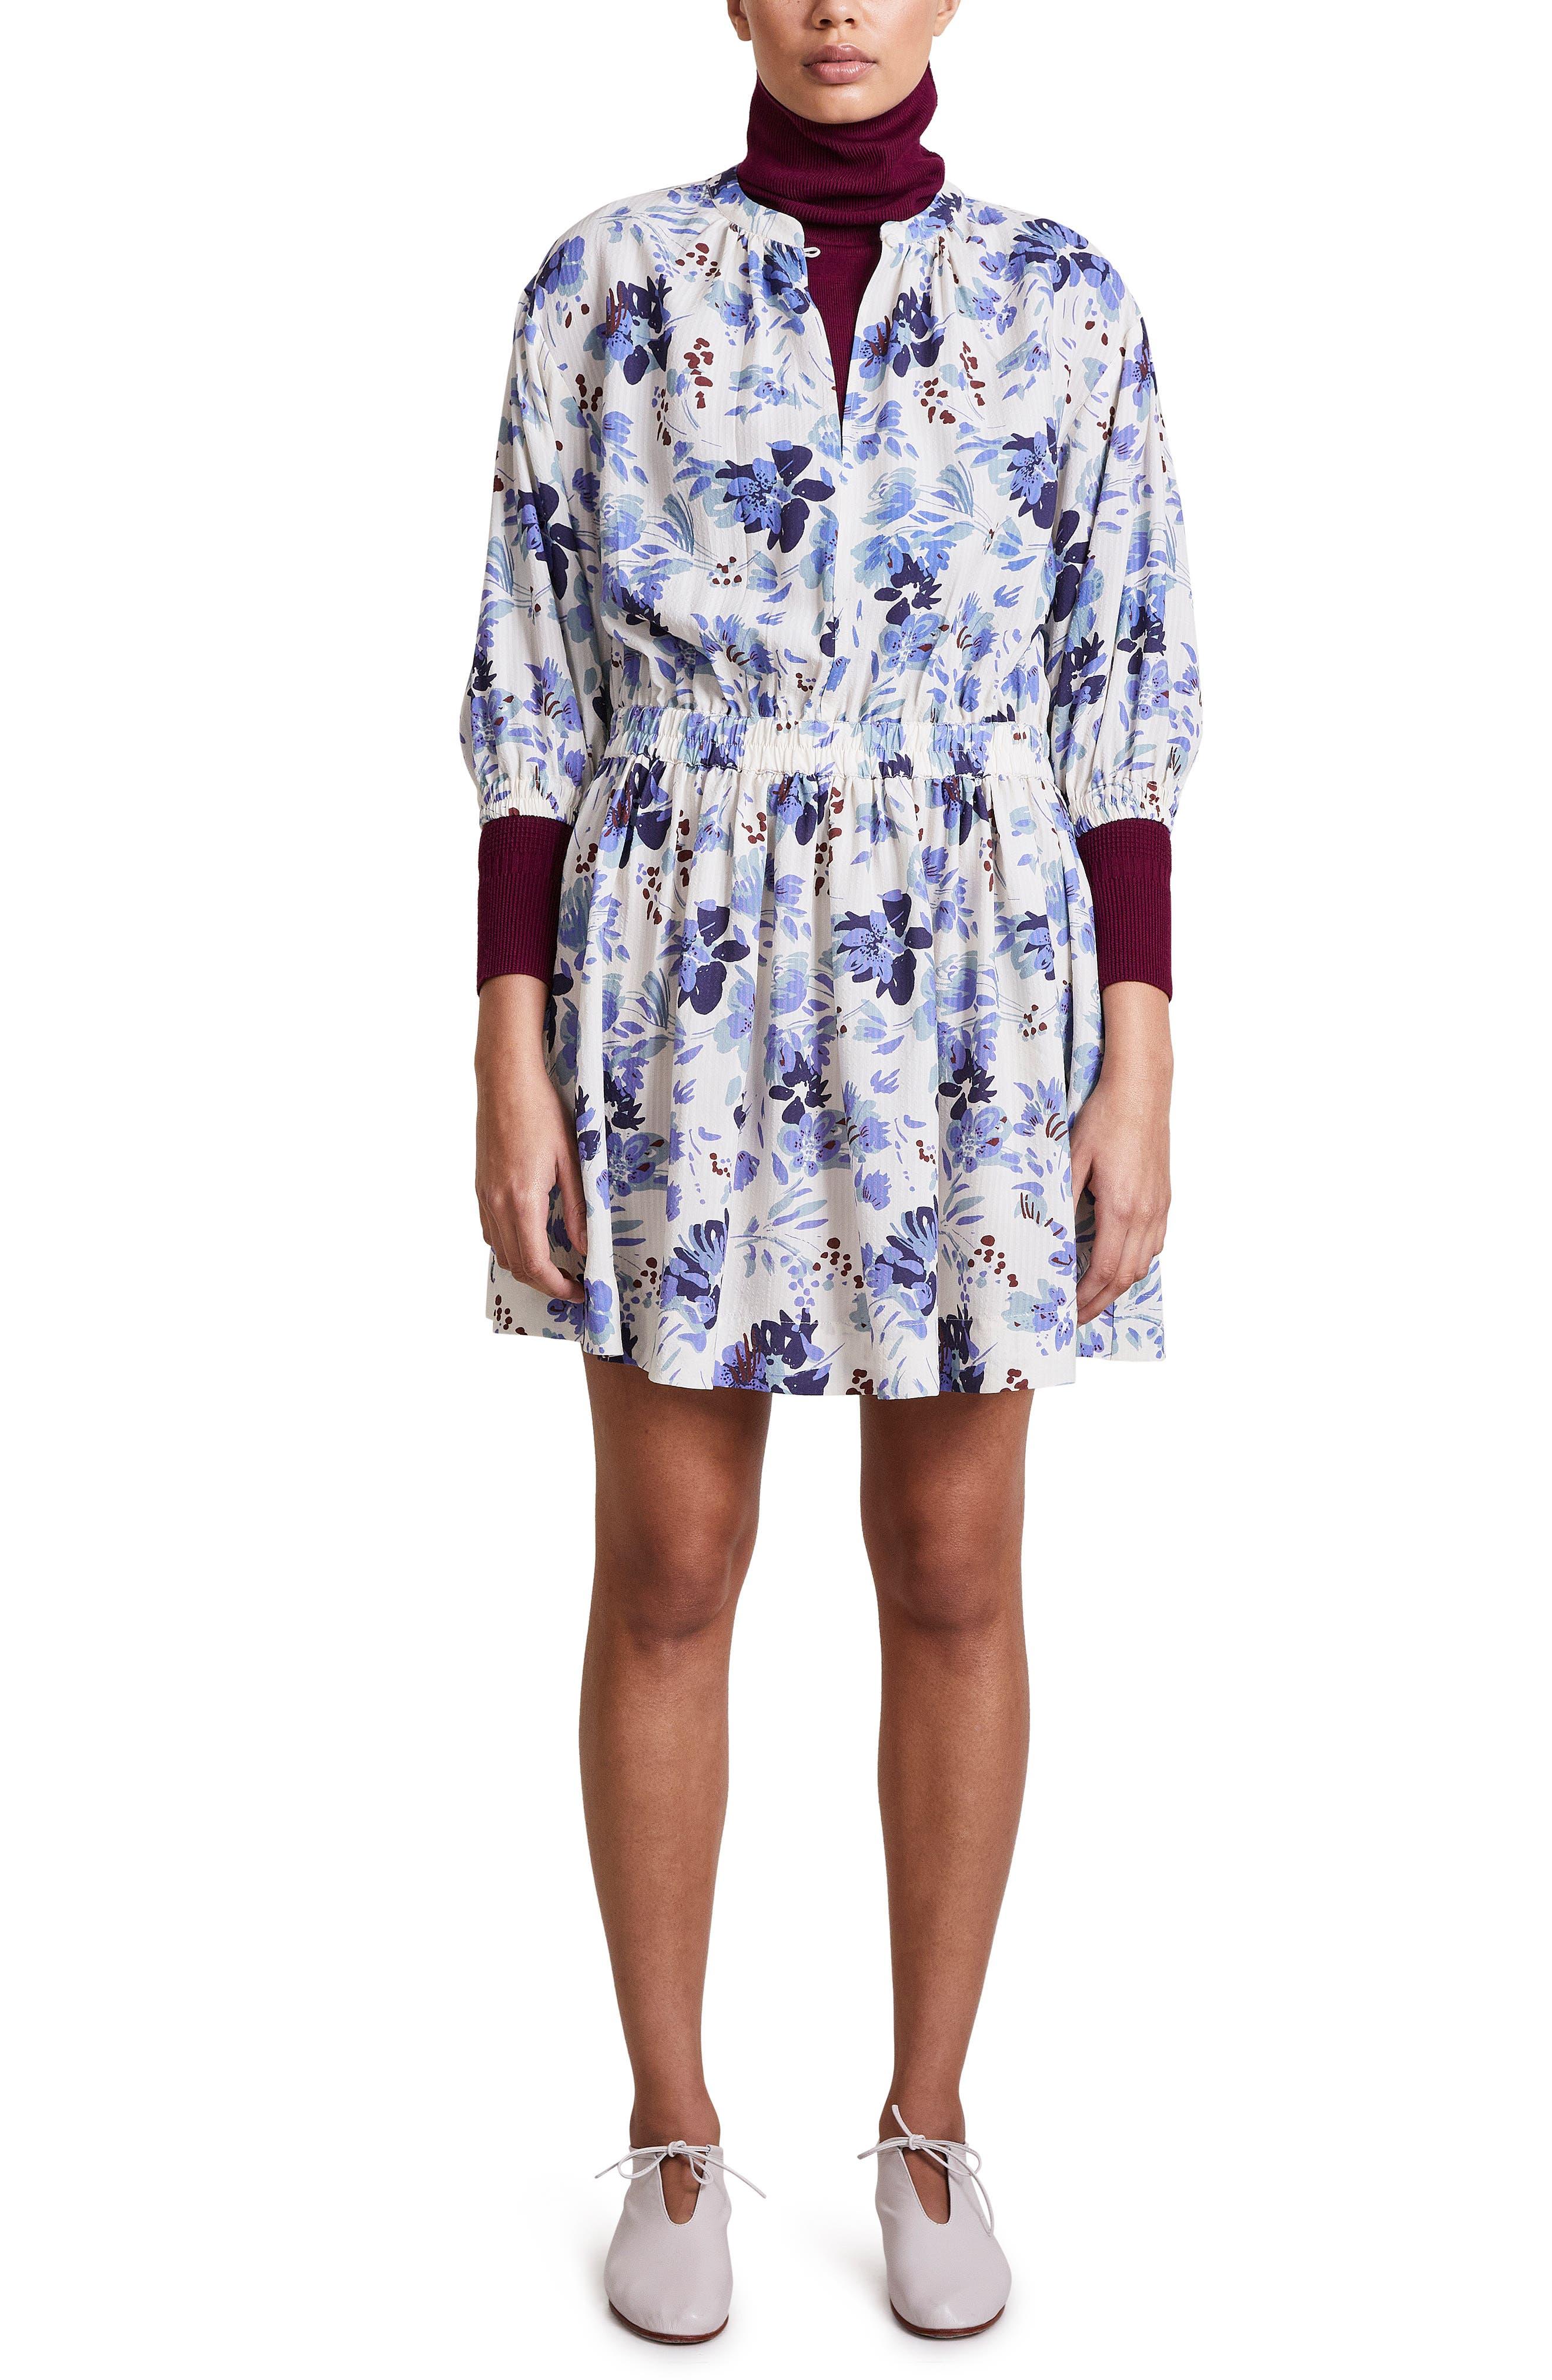 Mona Long Sleeve Minidress